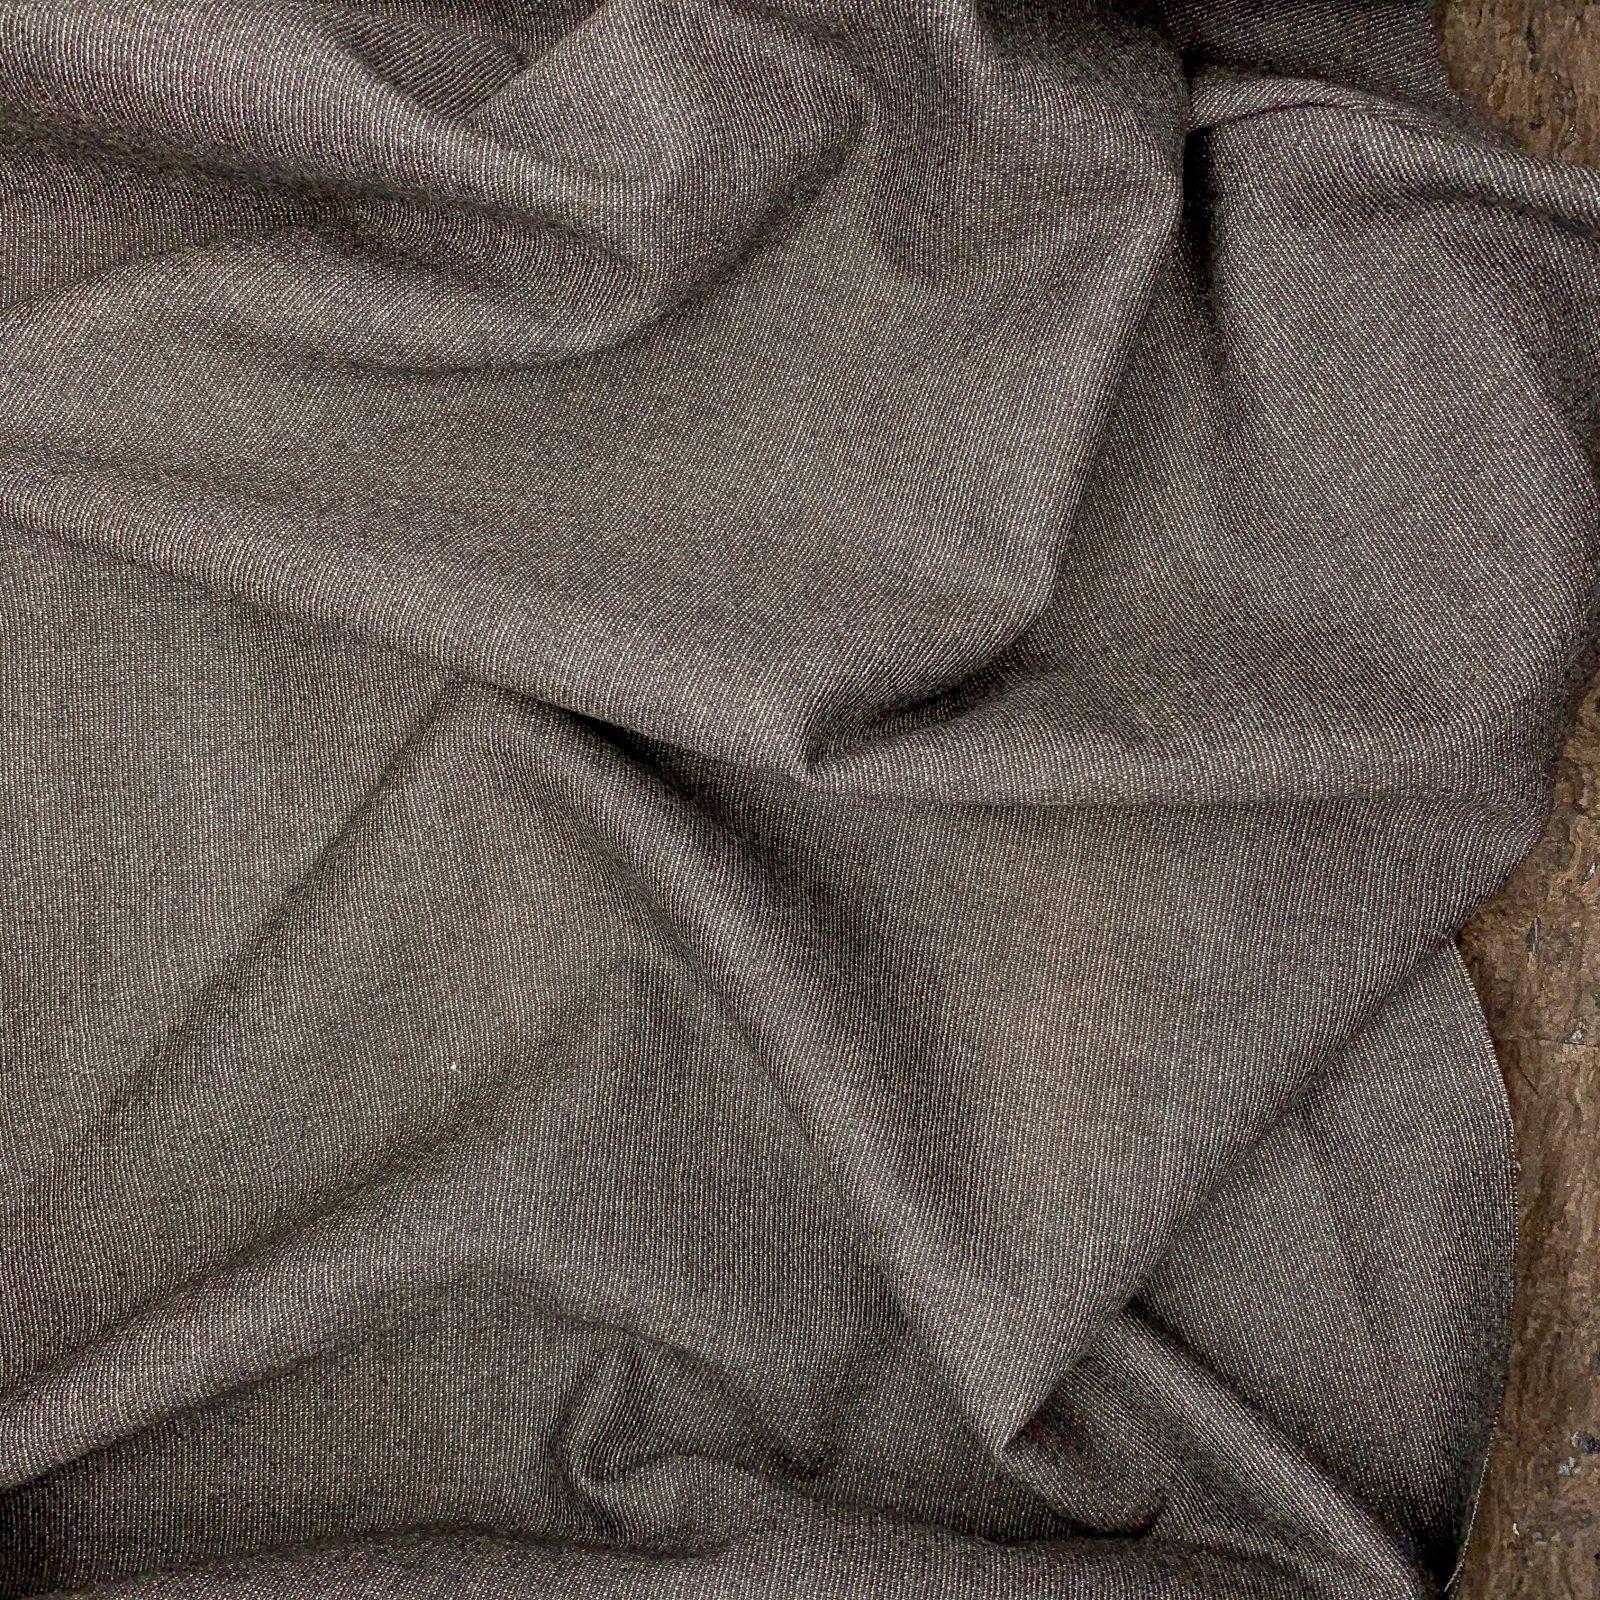 Italian Wool - Mole Brown